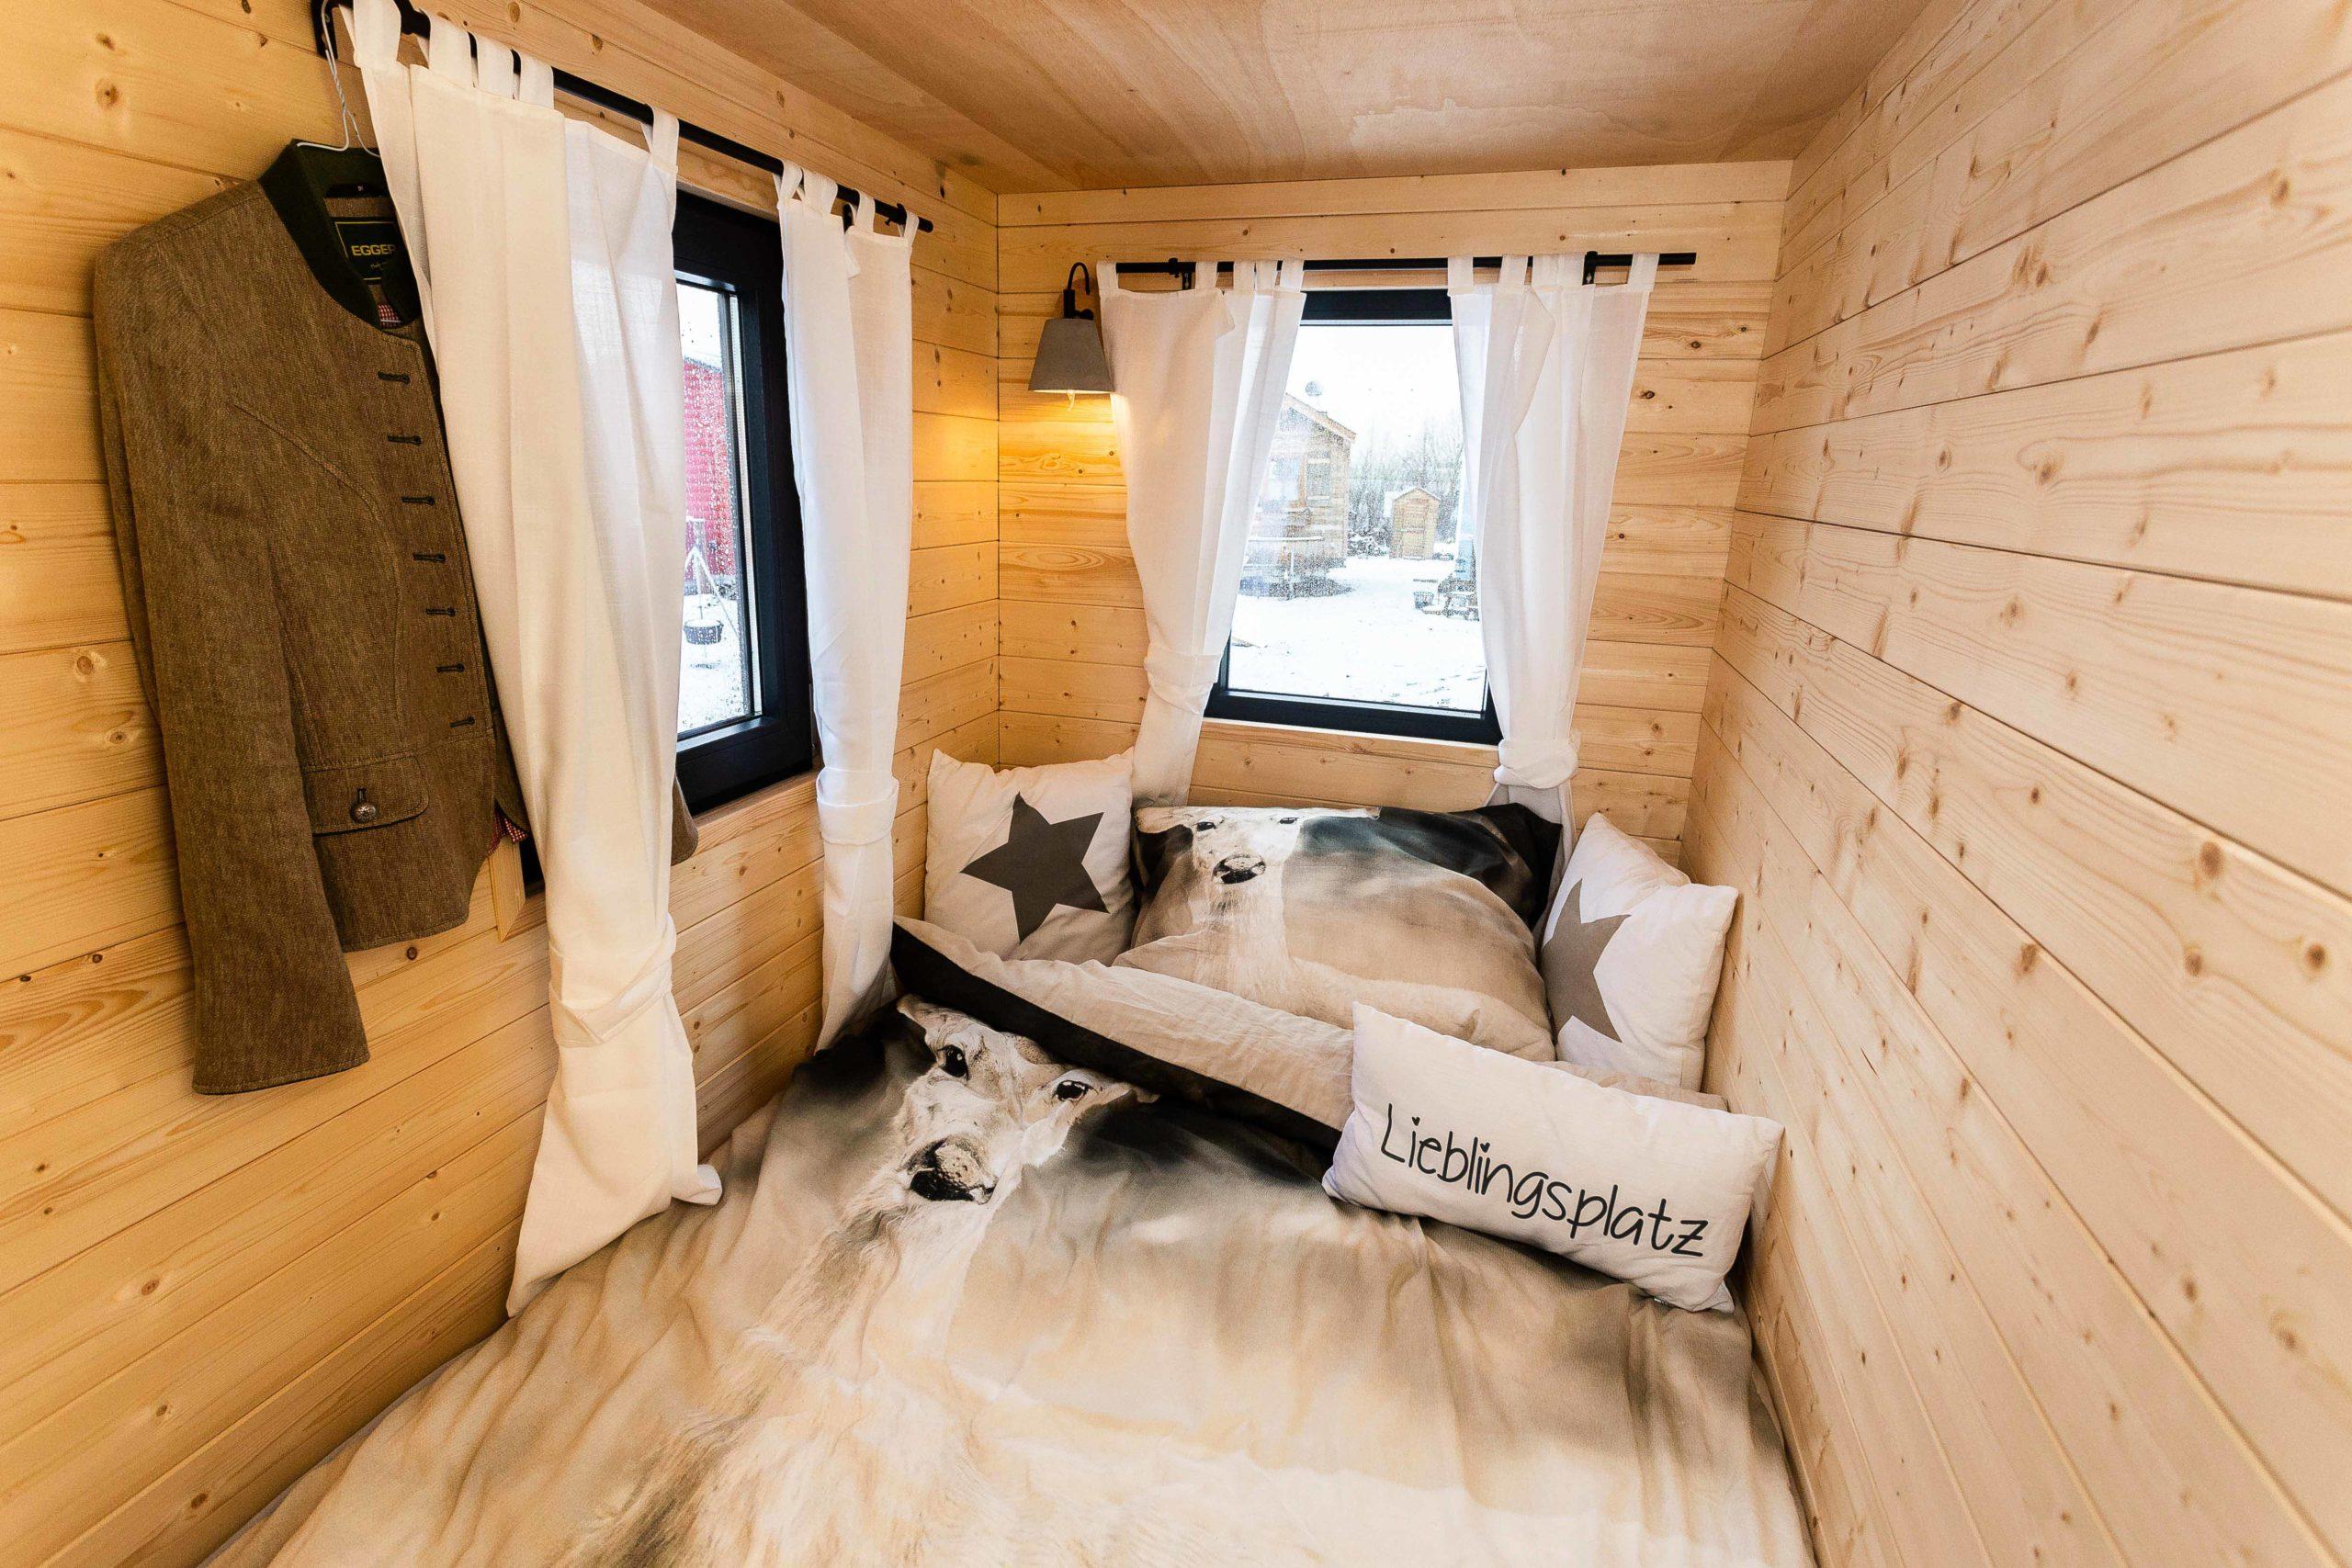 mobiles-tiny-house-australien-vital-camp-gmbh-23